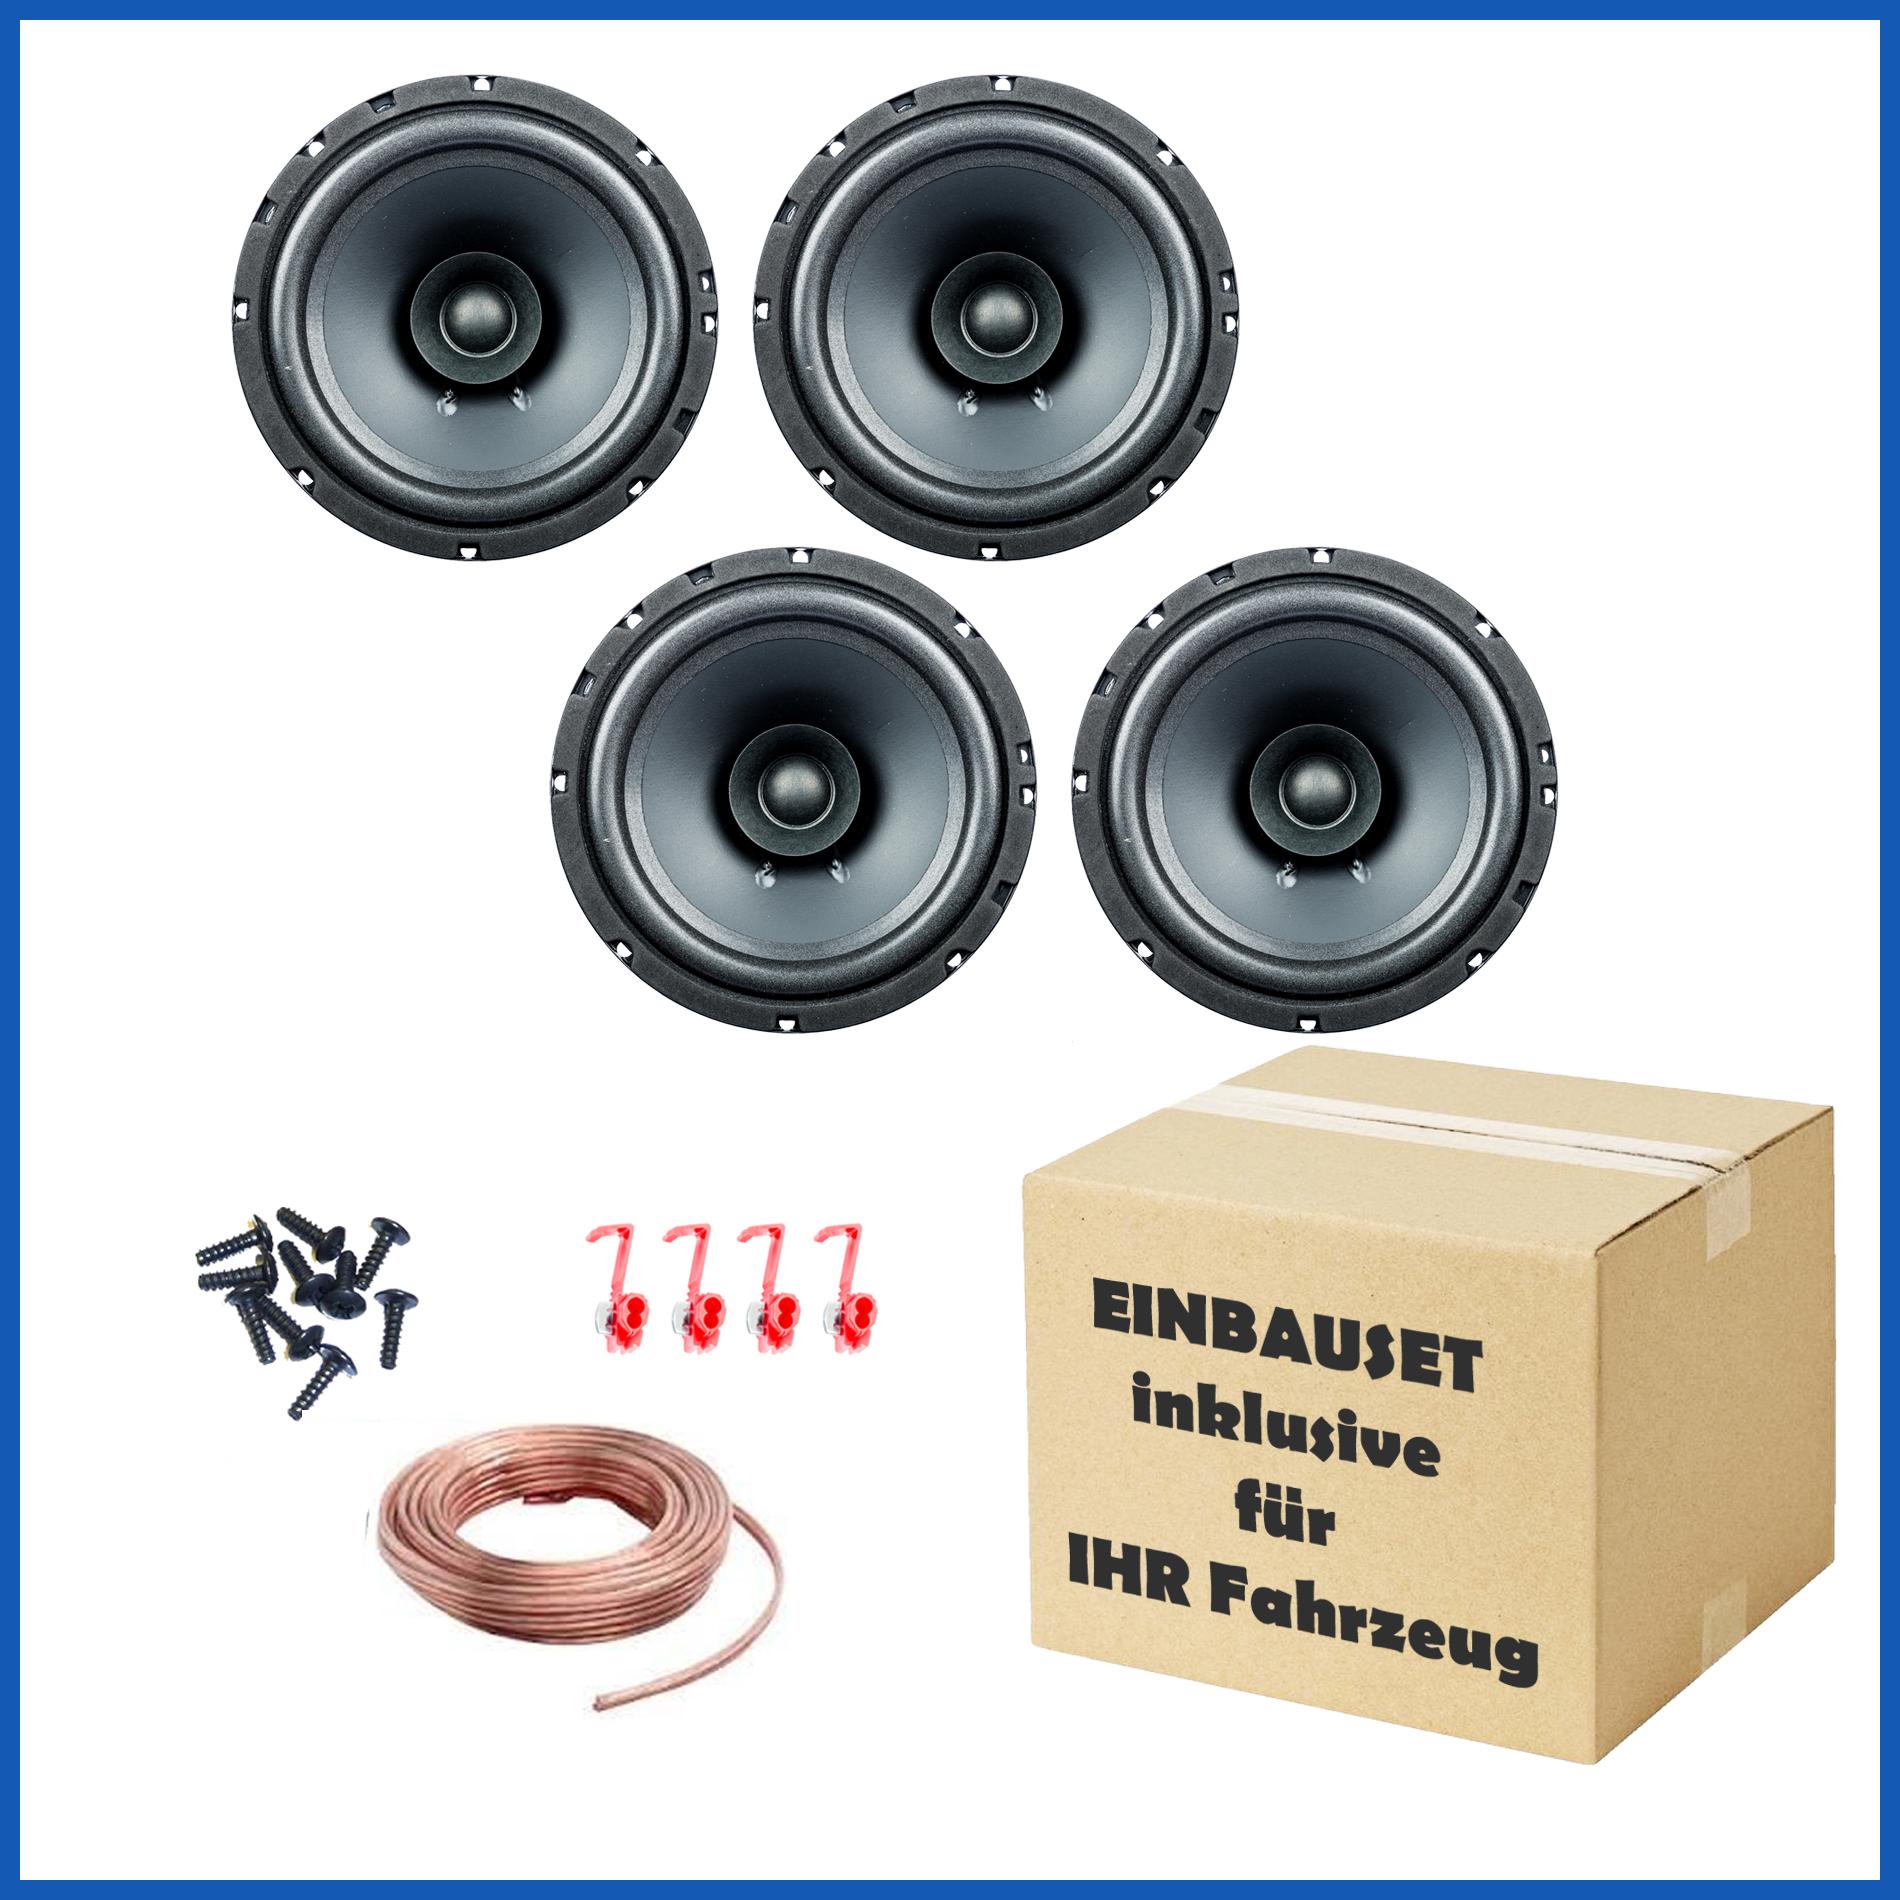 [Paket] 2 Paar PG Audio EVO I 16.2, 16 cm Dual Cone Lautsprecher für mehrere Fahrzeugmodelle